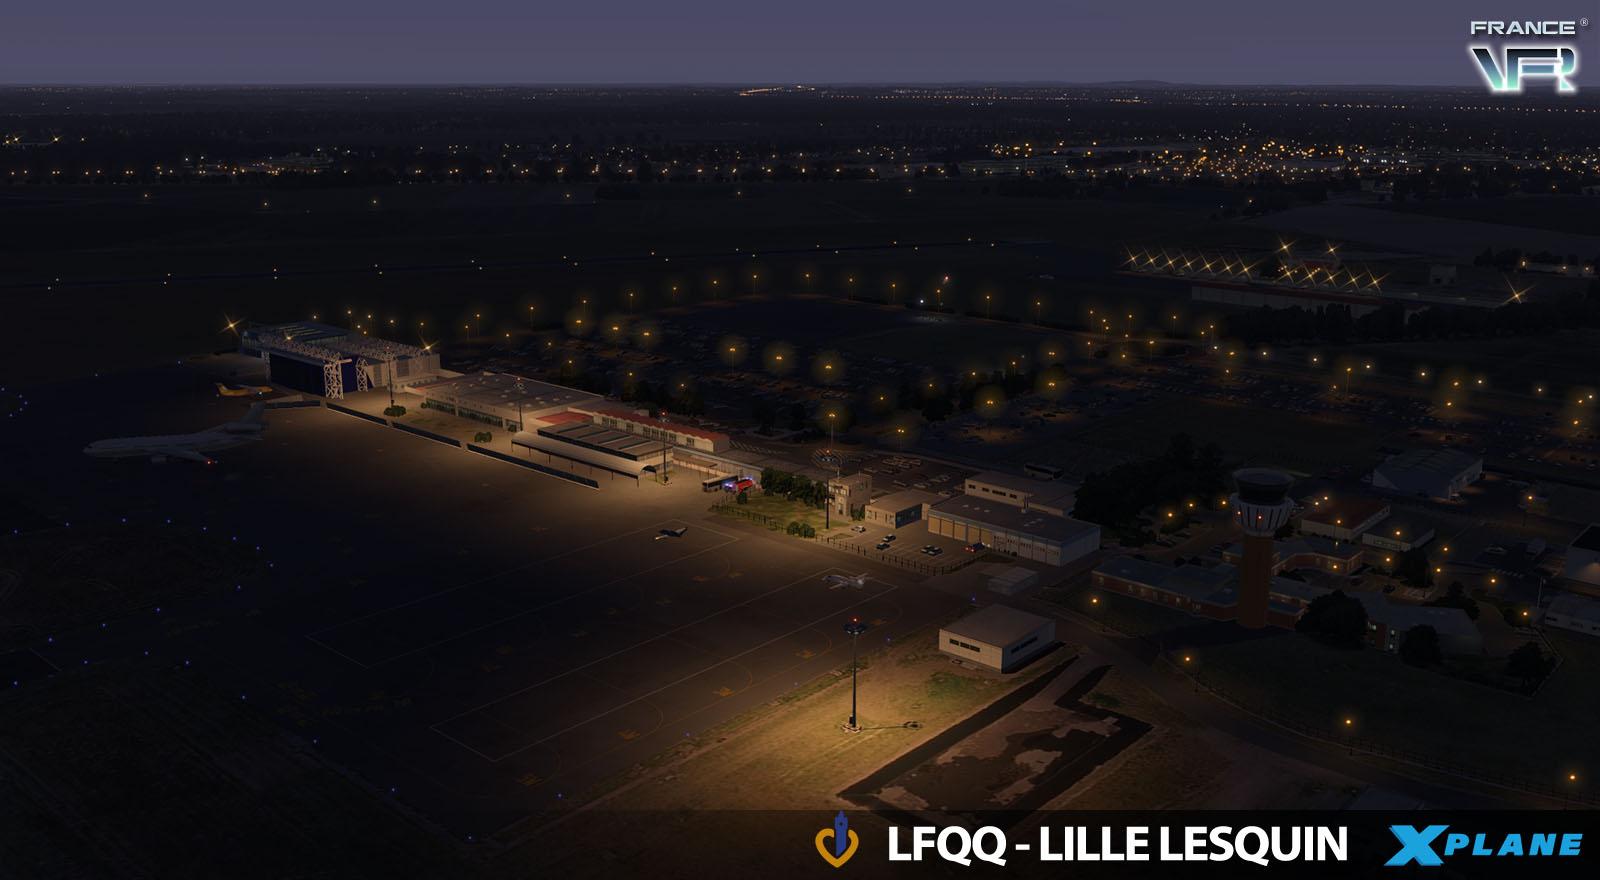 LFQQXP_39